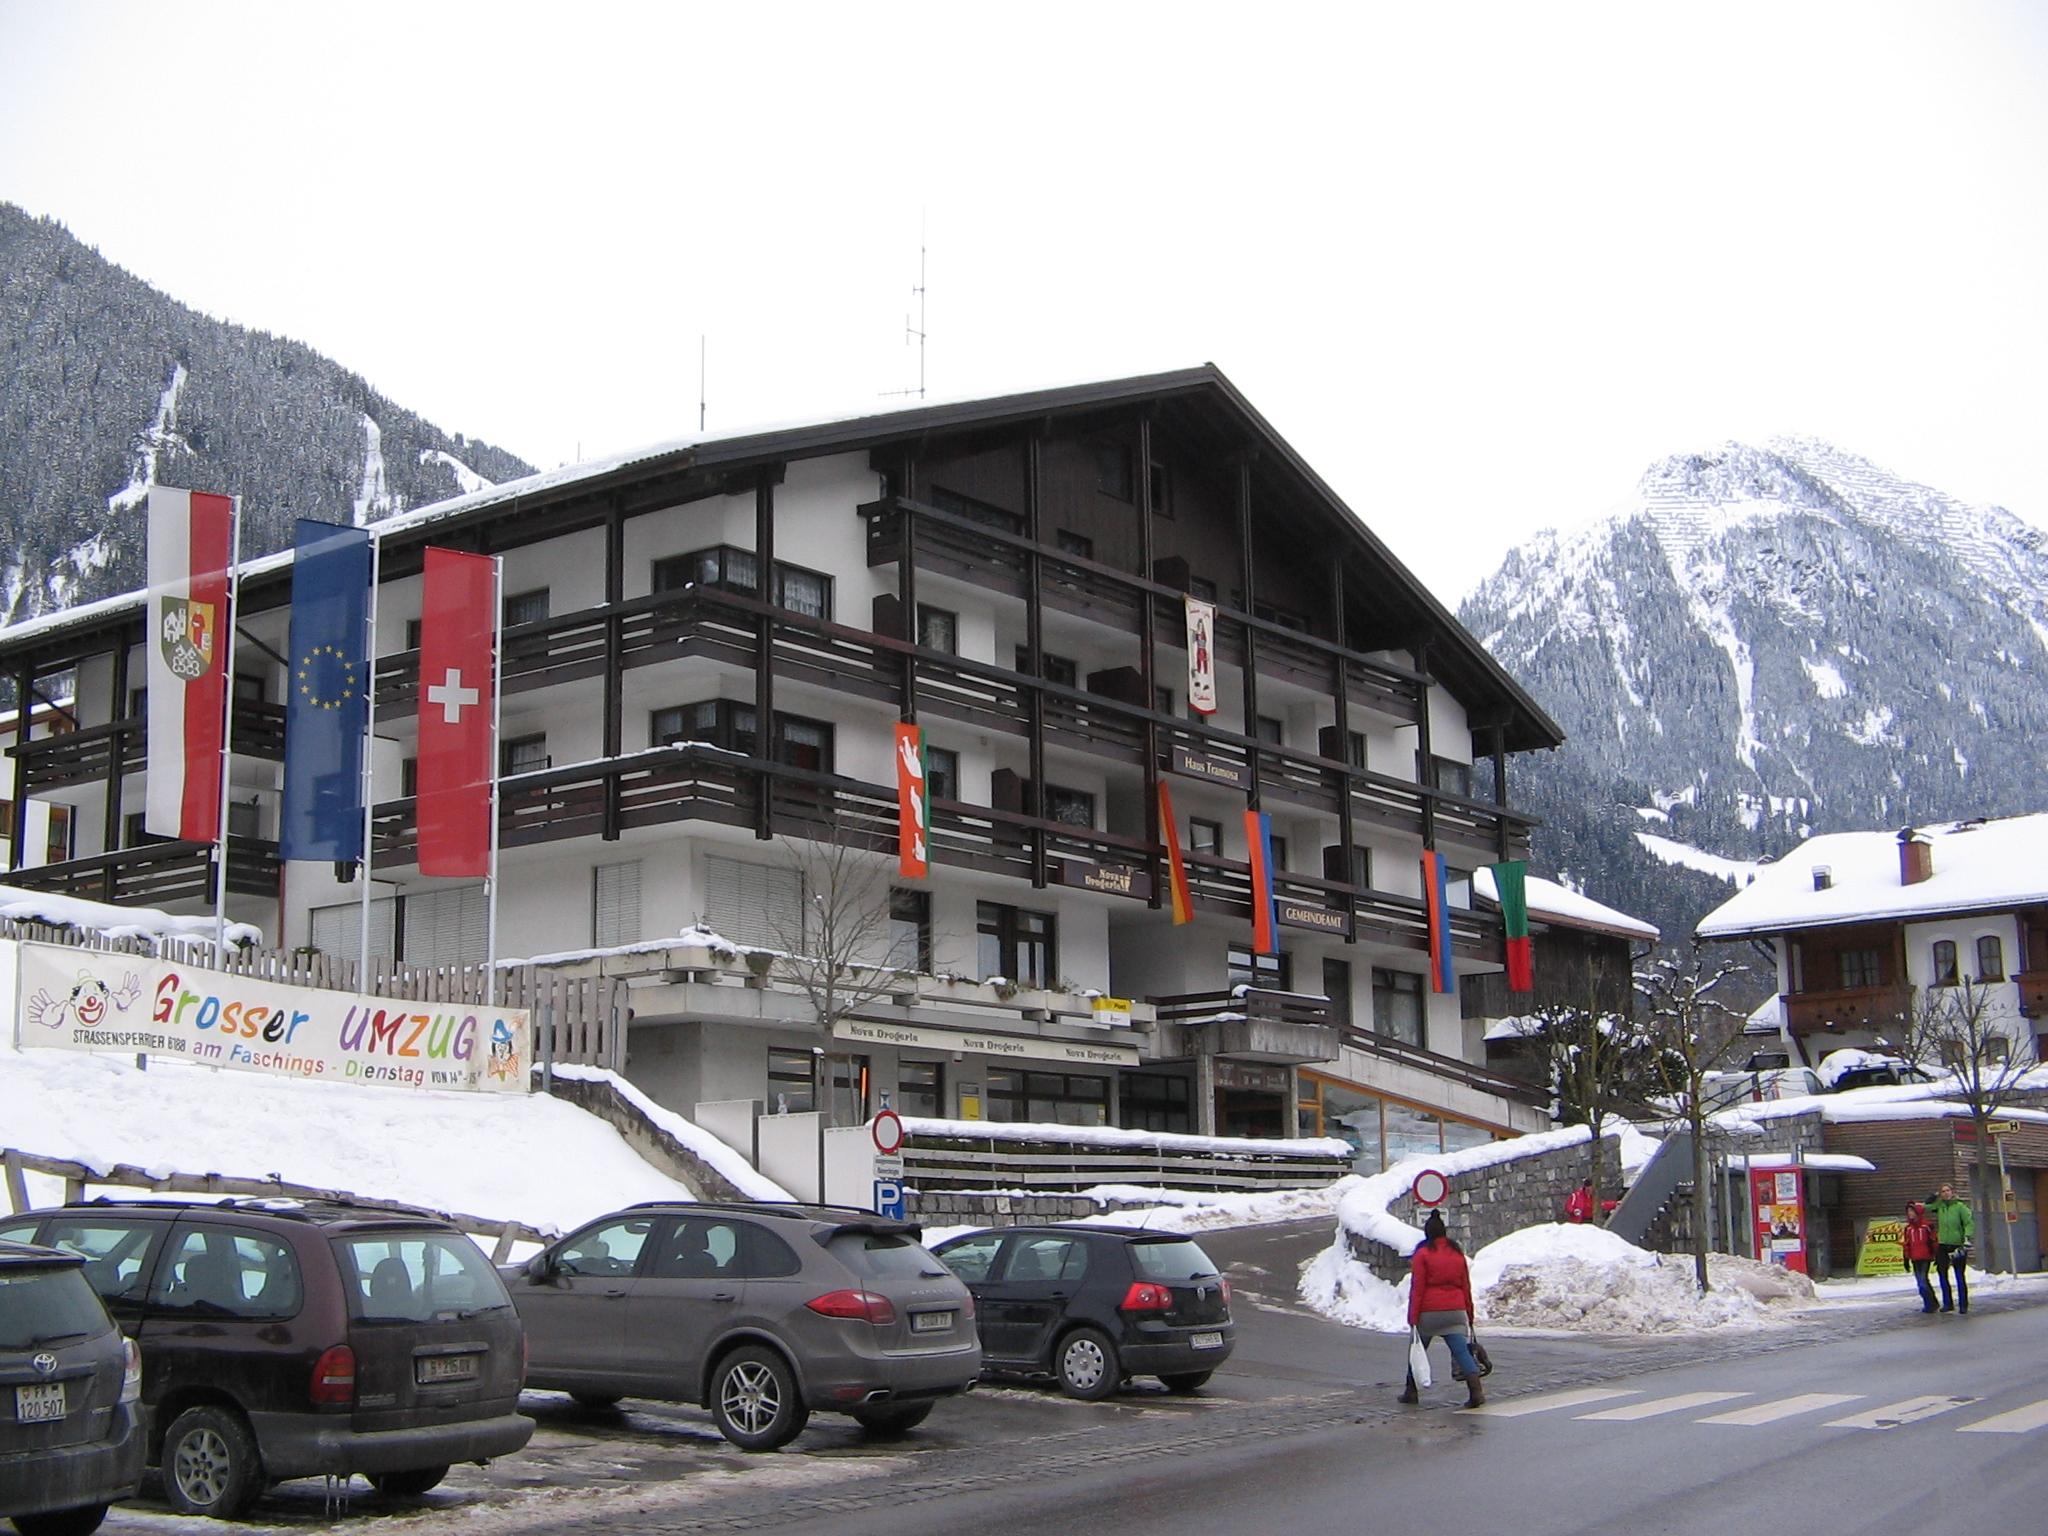 Hotels St. Gallenkirch - Gortipohl - Hotel St - Bergfex